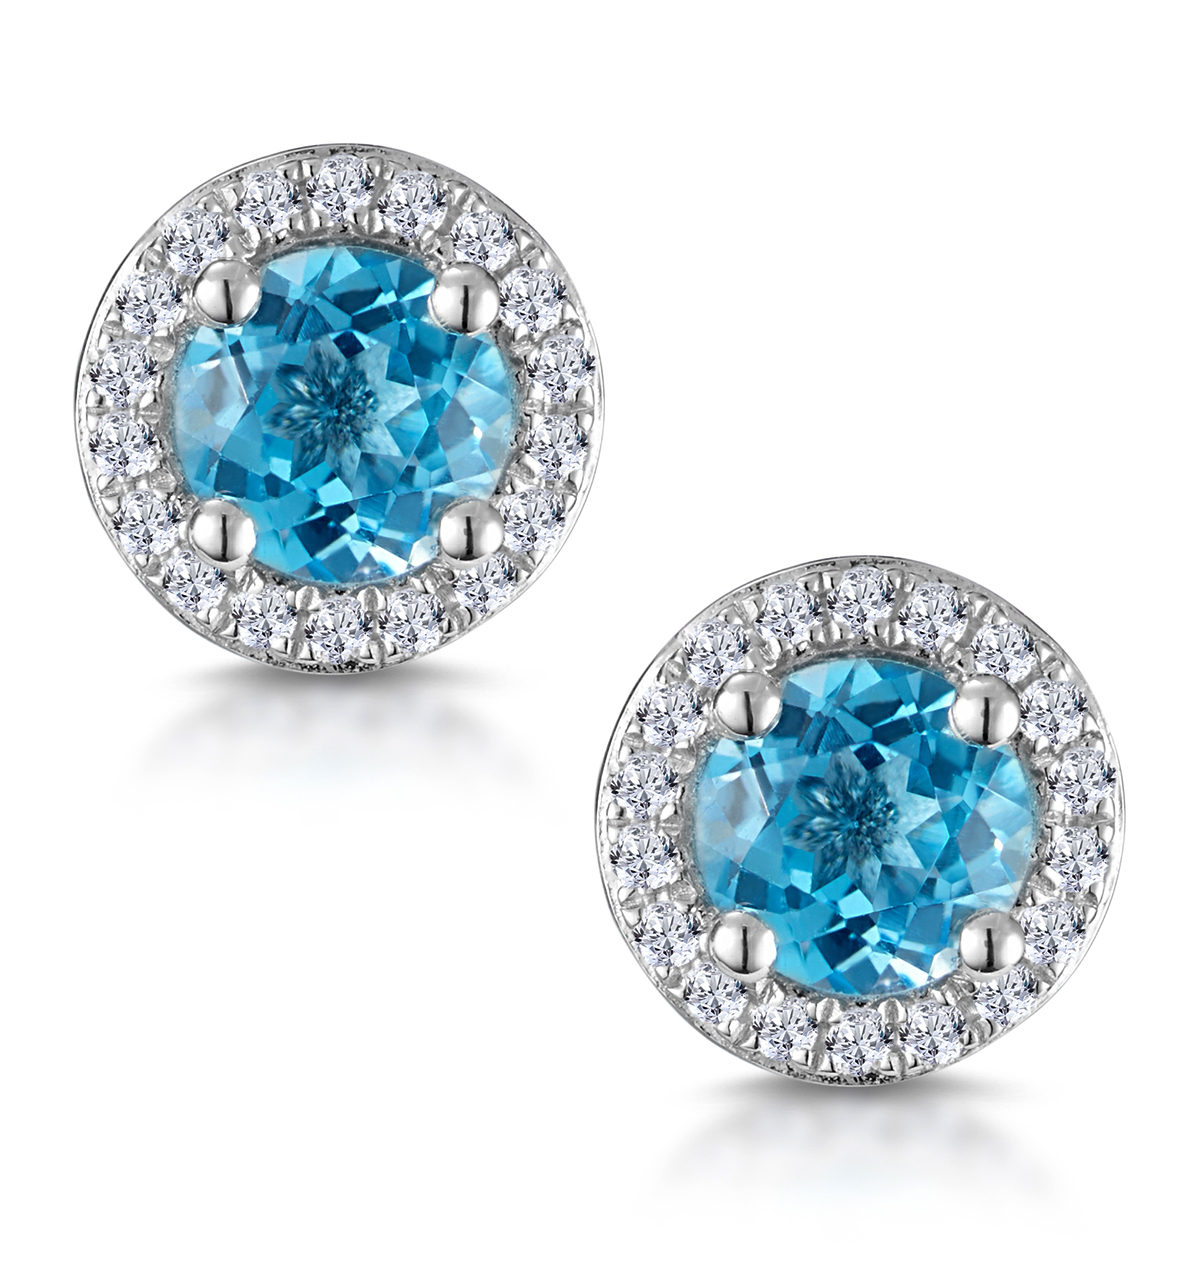 SWISS BLUE TOPAZ AND DIAMOND HALO STELLATO EARRINGS IN 9K WHITE GOLD